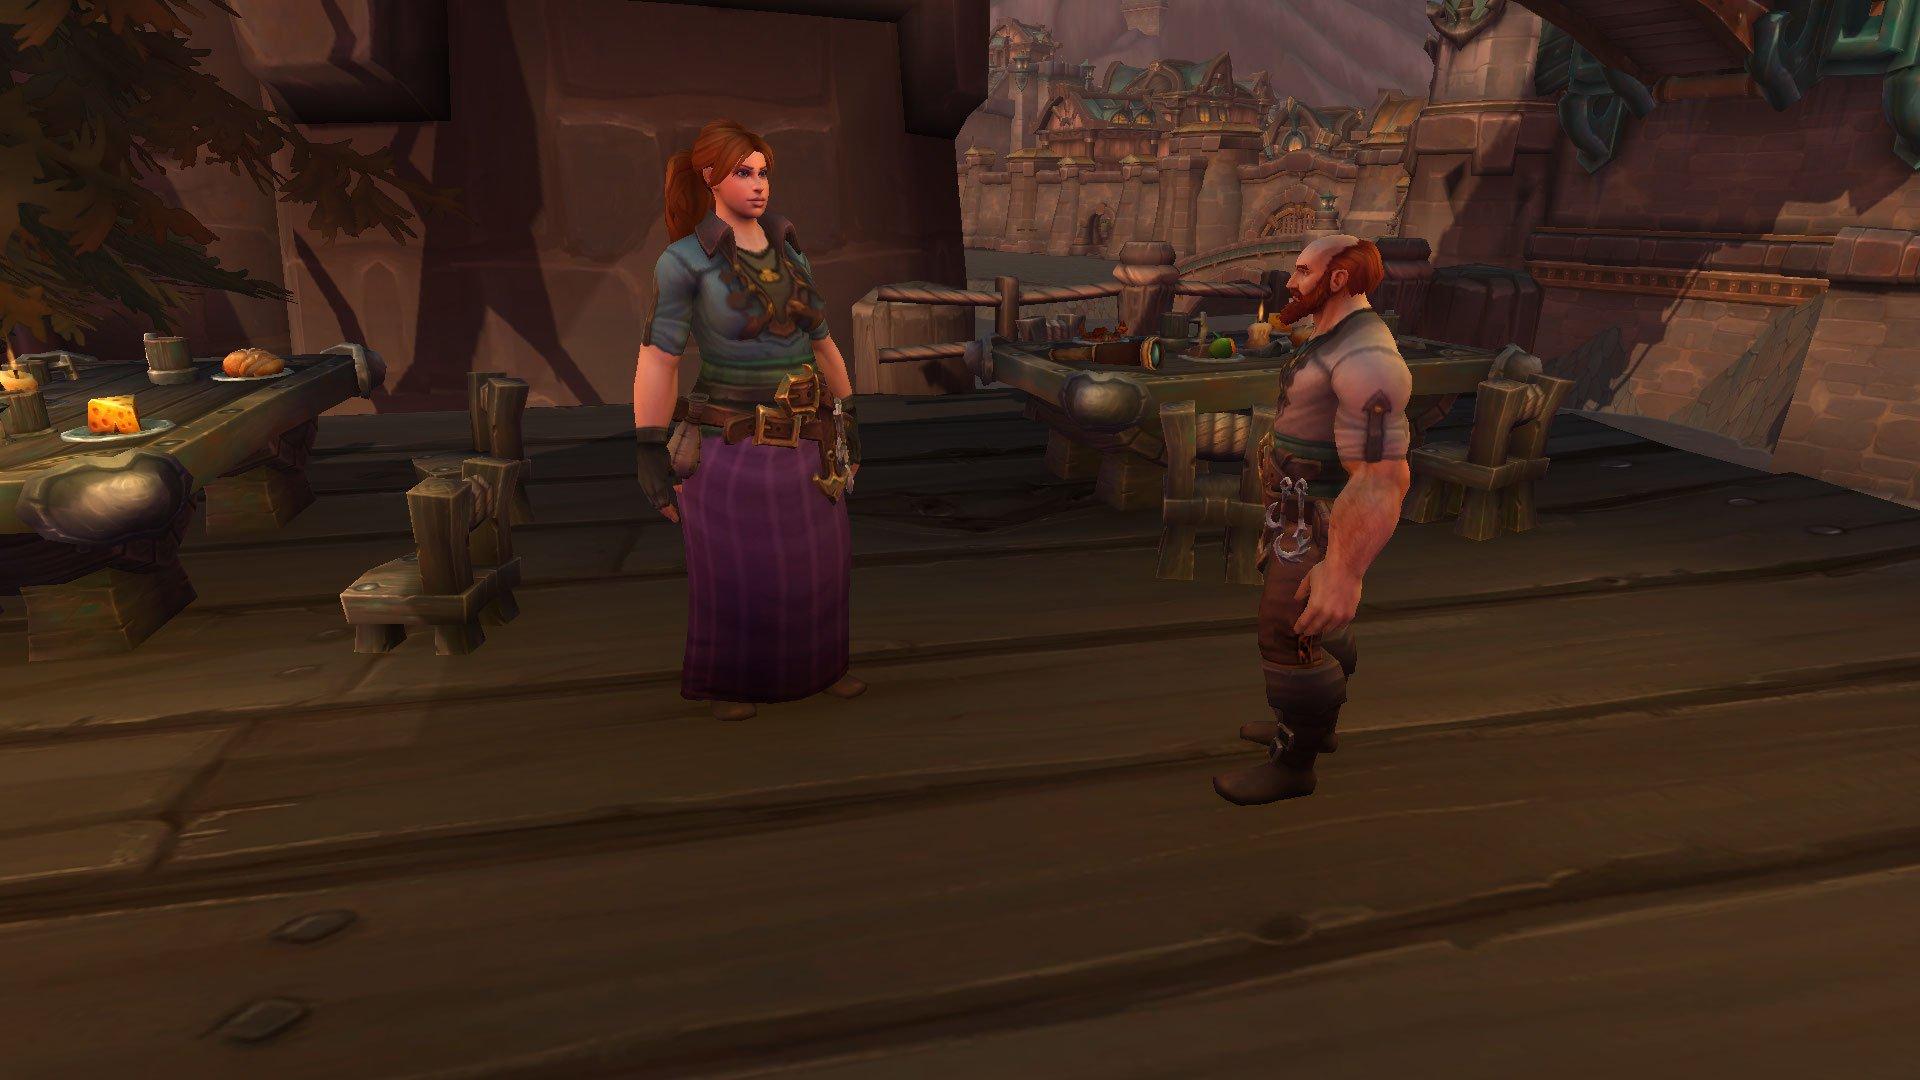 Battle for Azeroth - Boralus Updates, BfA Profession